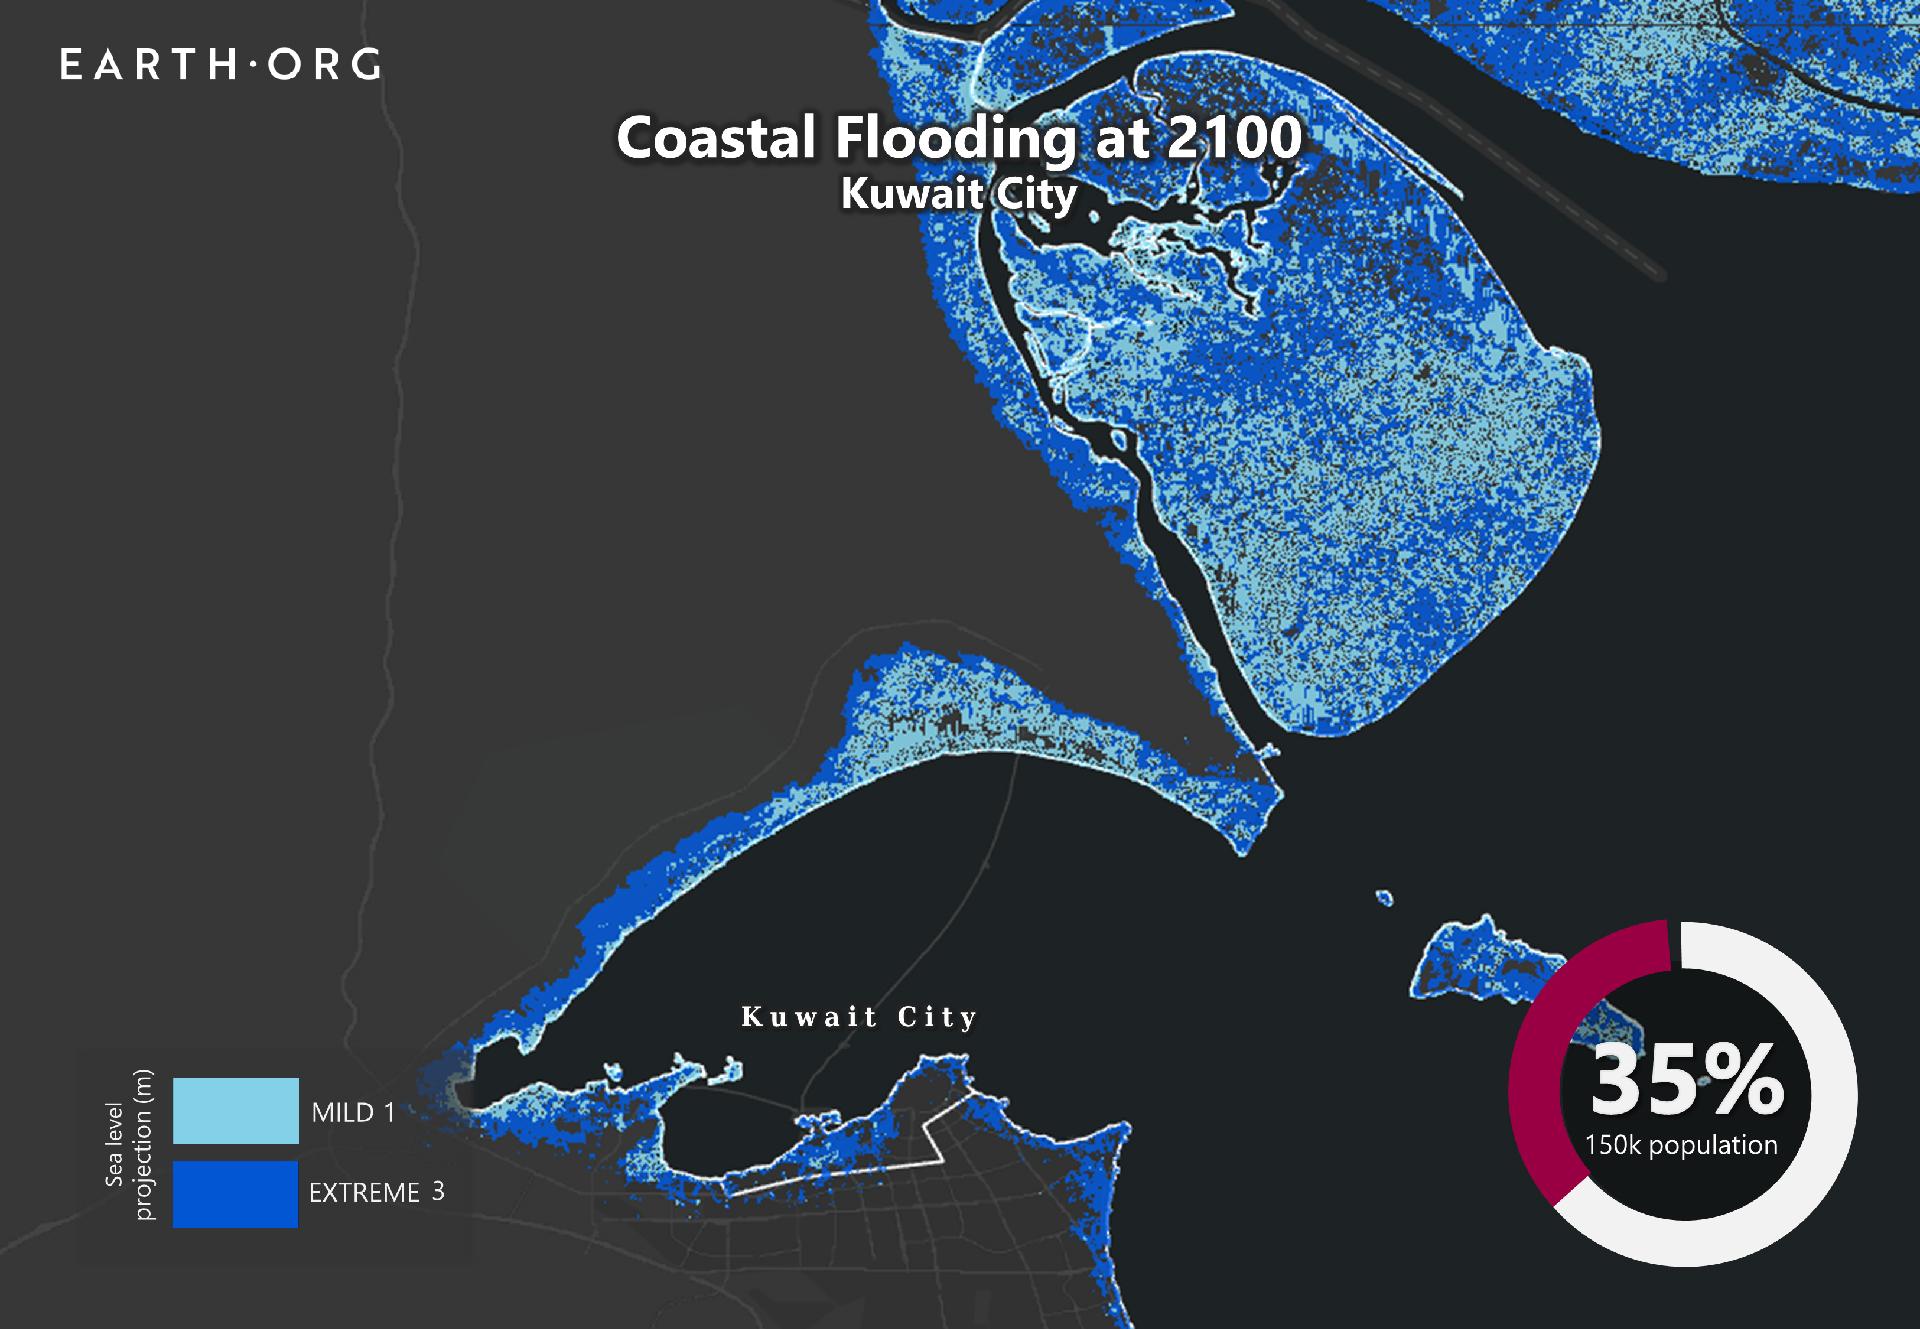 sea level rise by 2100 Kuwait City